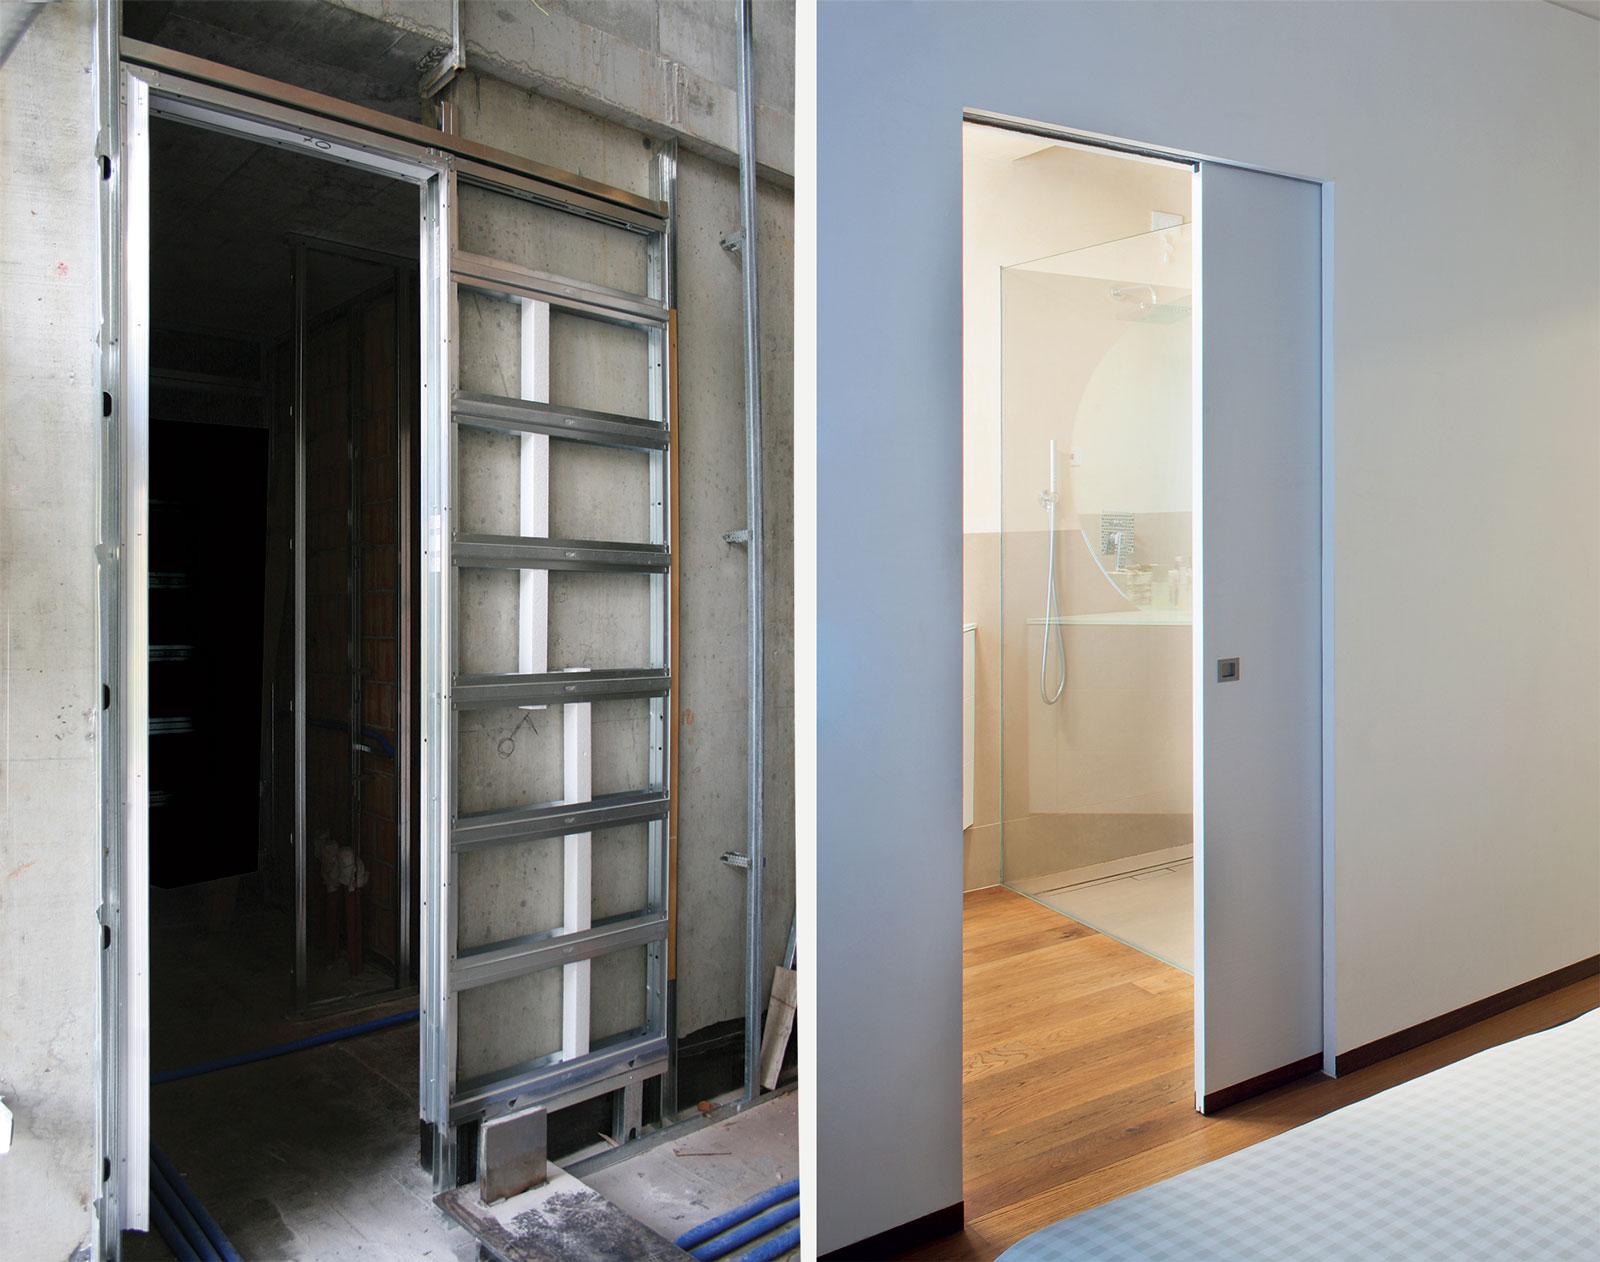 Biasup eclisse esterno per porte scorrevoli with immagini - Porte scorrevoli immagini ...